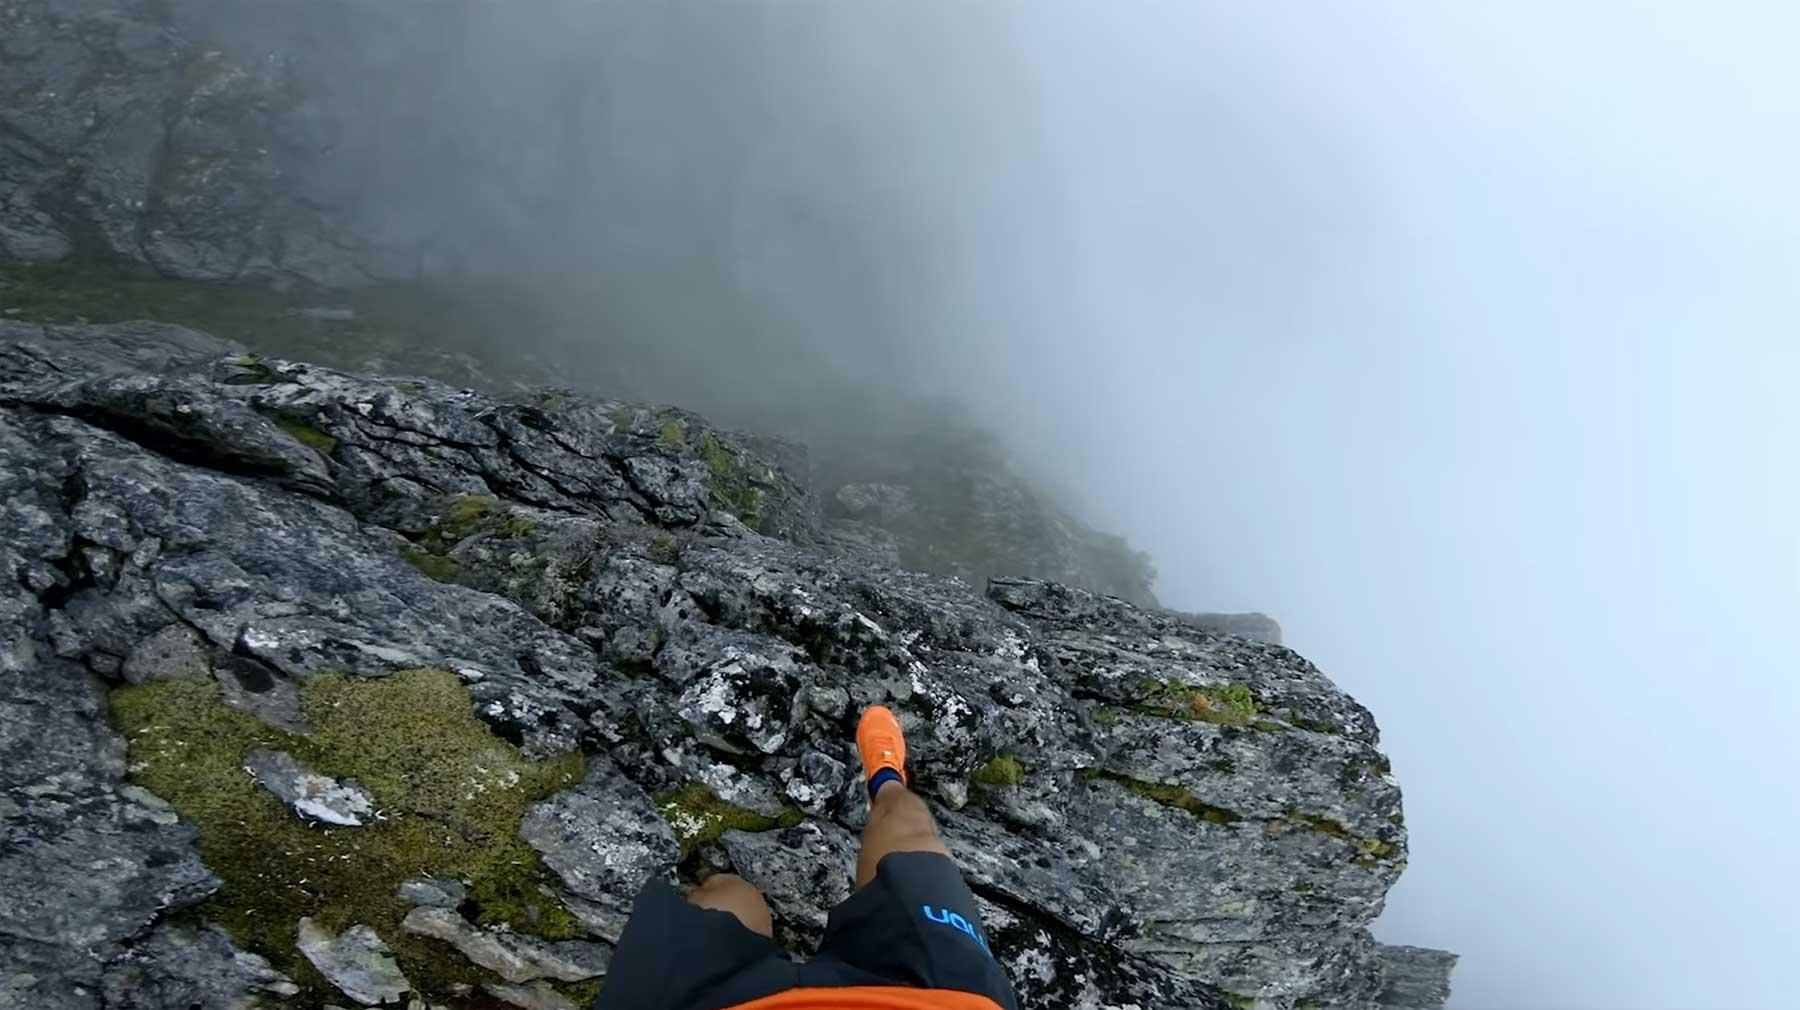 Mit Kilian Jornet auf Bergkämmen laufen Kilian-Jornet_Running-Ridges